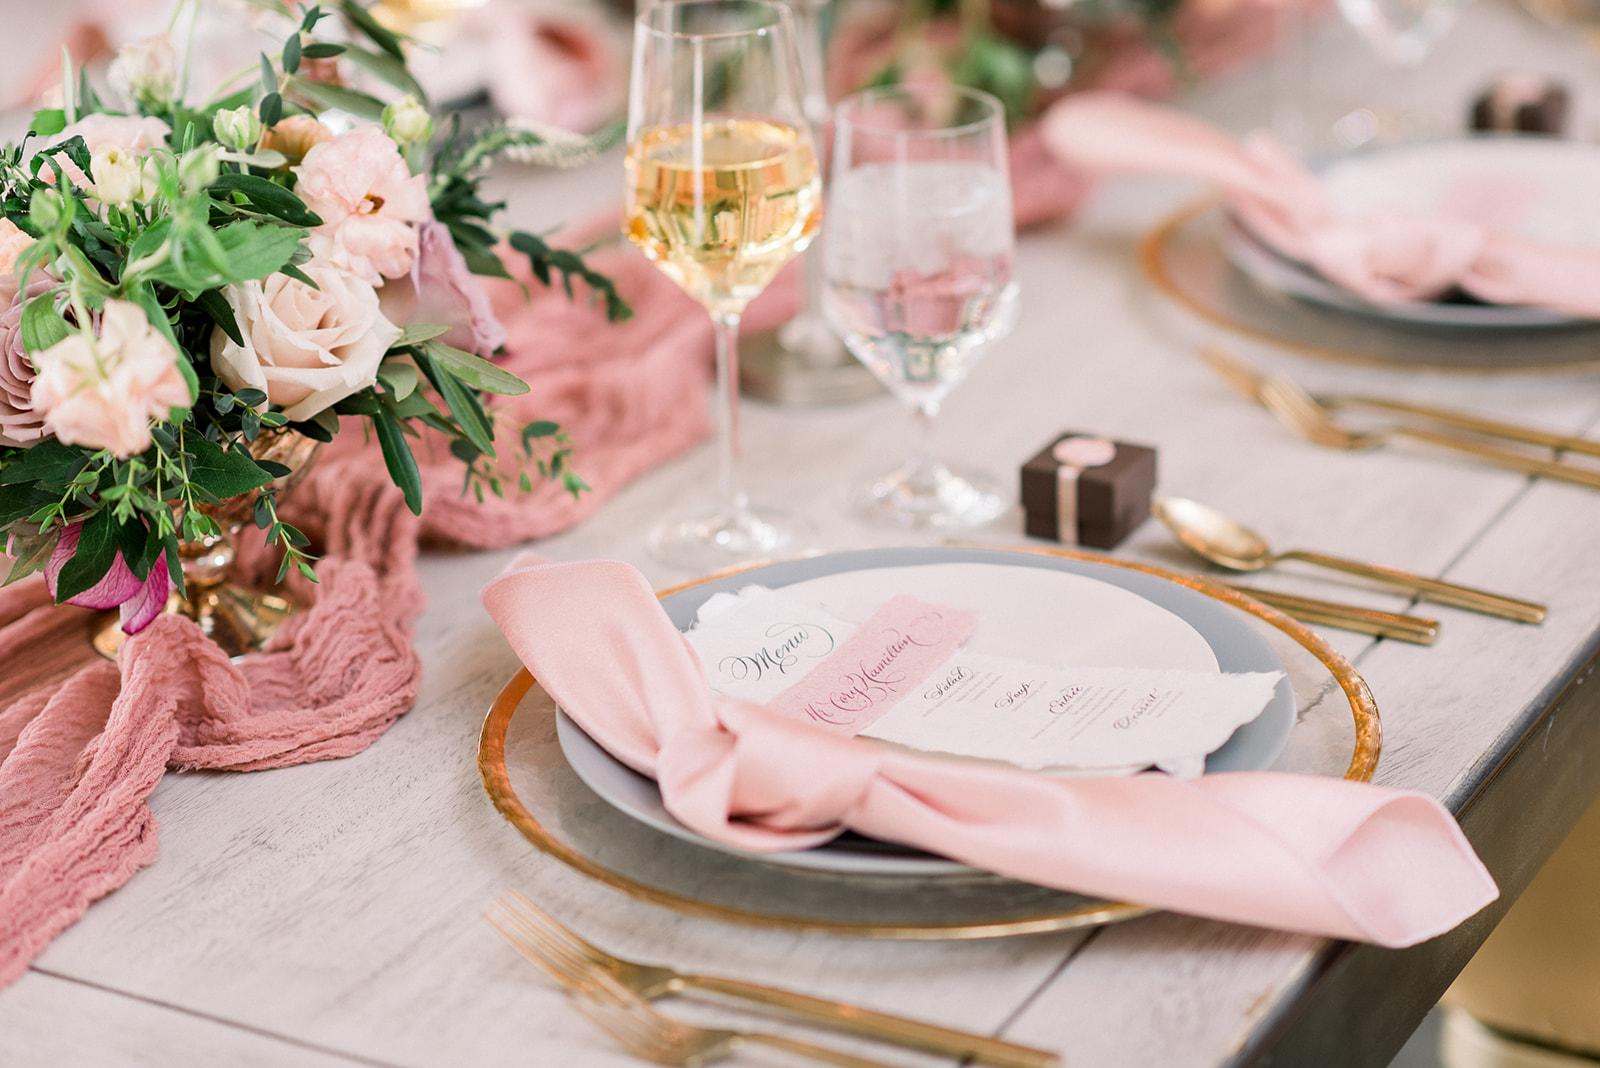 Blush and mauve table decor